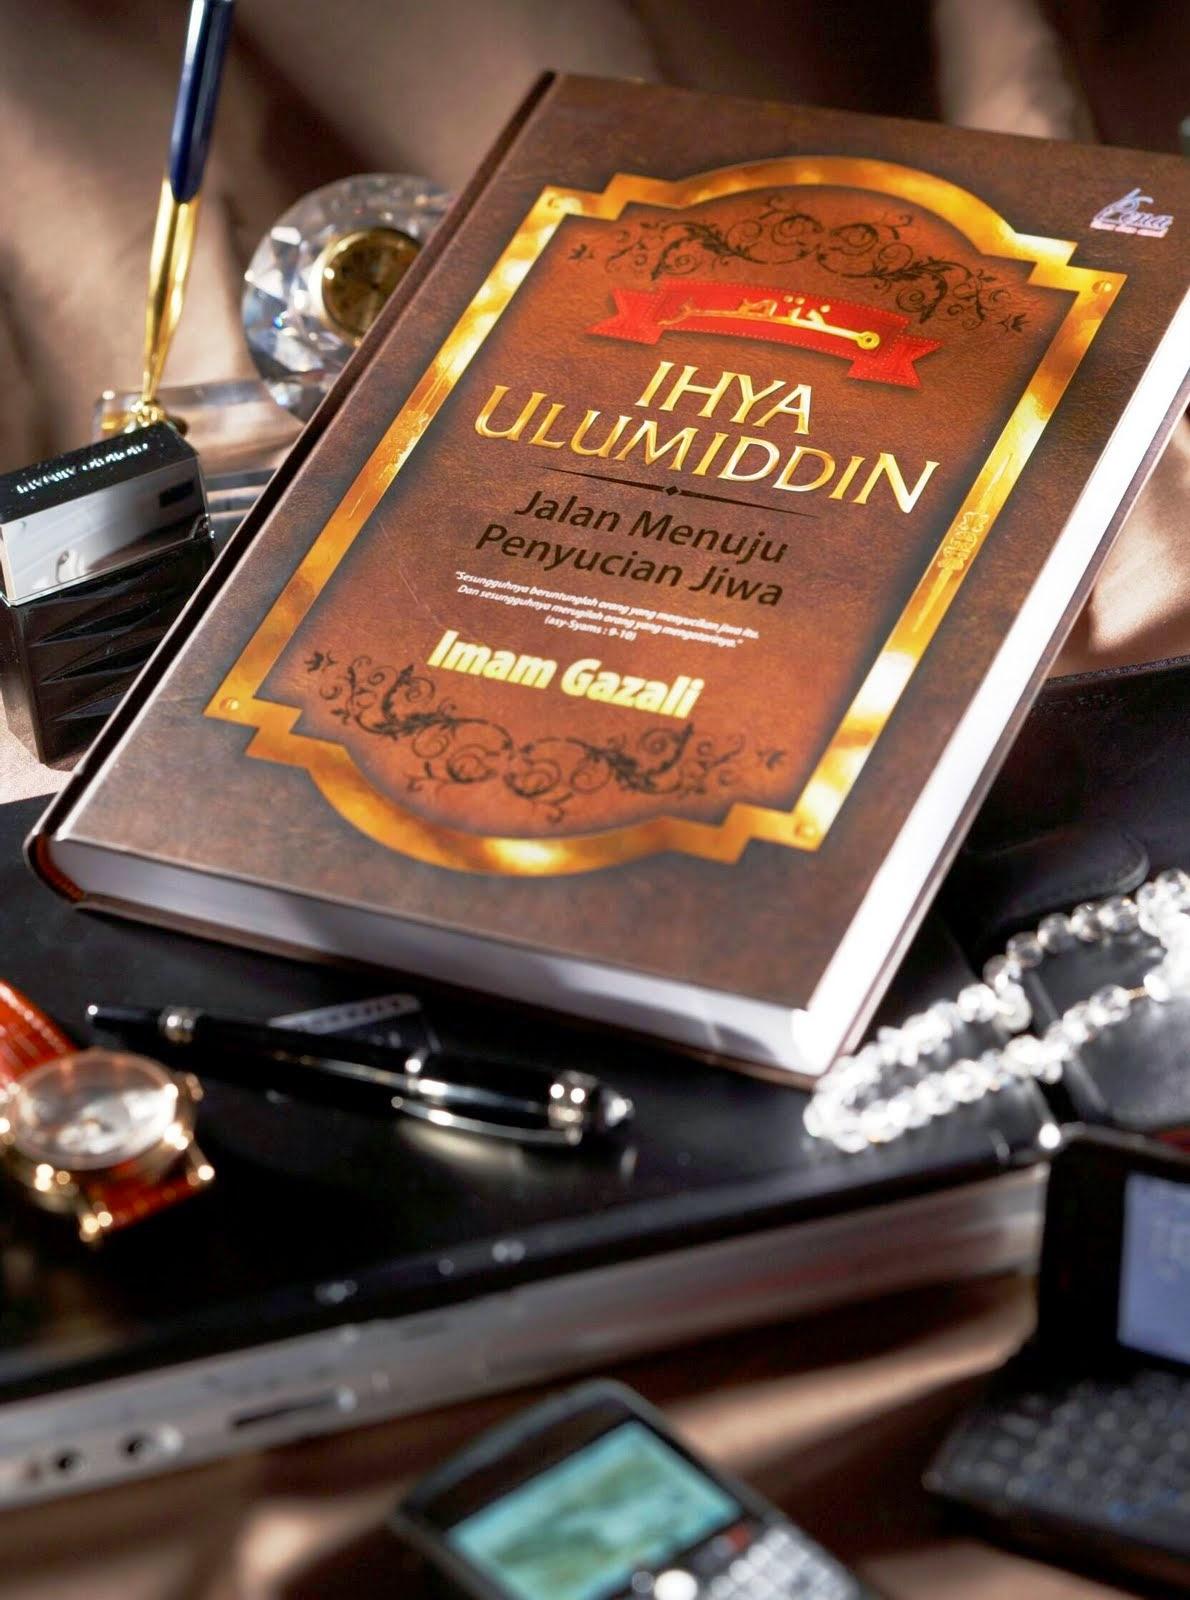 Terjemahan-Ihya-Ulumuddin